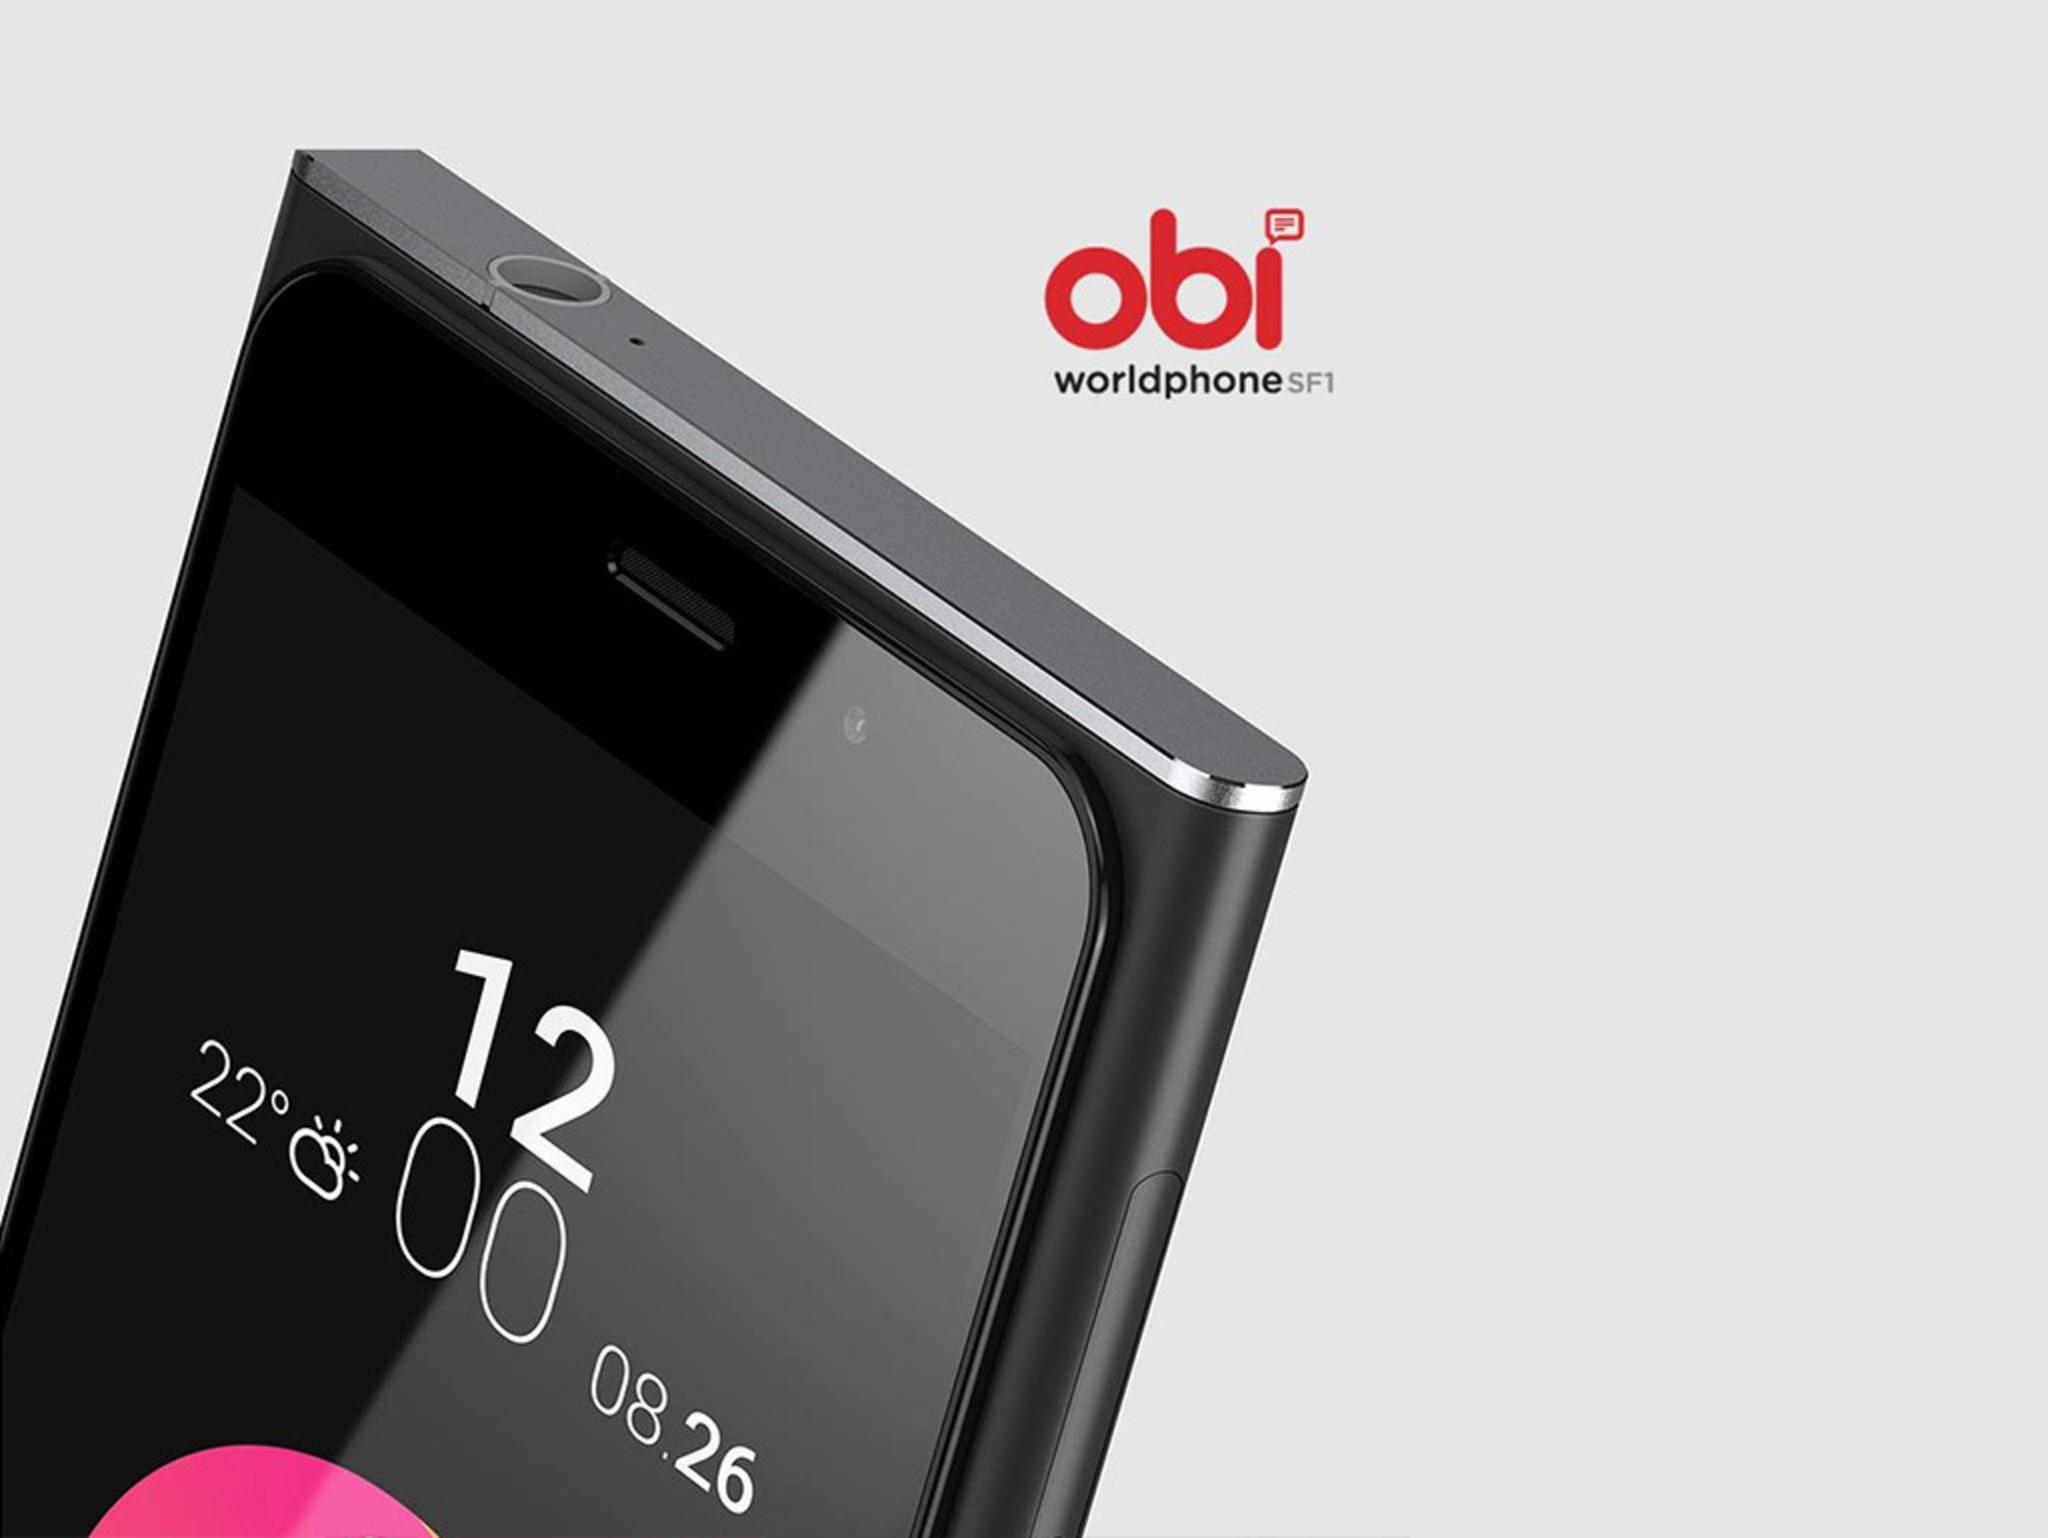 SF1-Obi-Phone-2